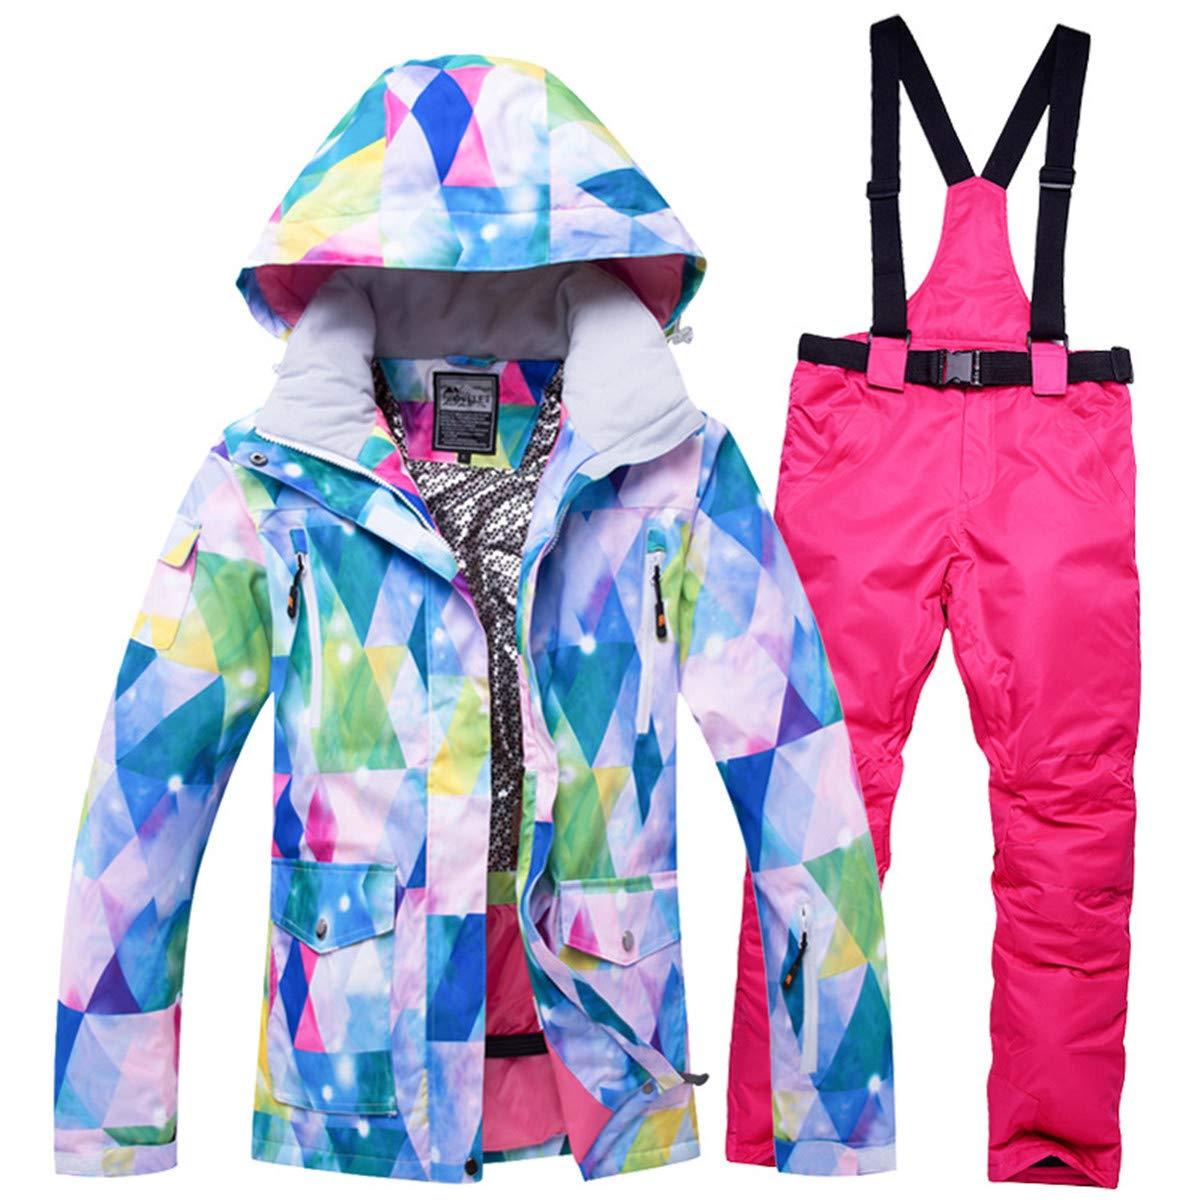 Snow 6 REWANGOING Women's Ski Bib Suit Winter Warm Jacket Waterproof Snowboard colorful Printed Ski Jacket and Pants Set